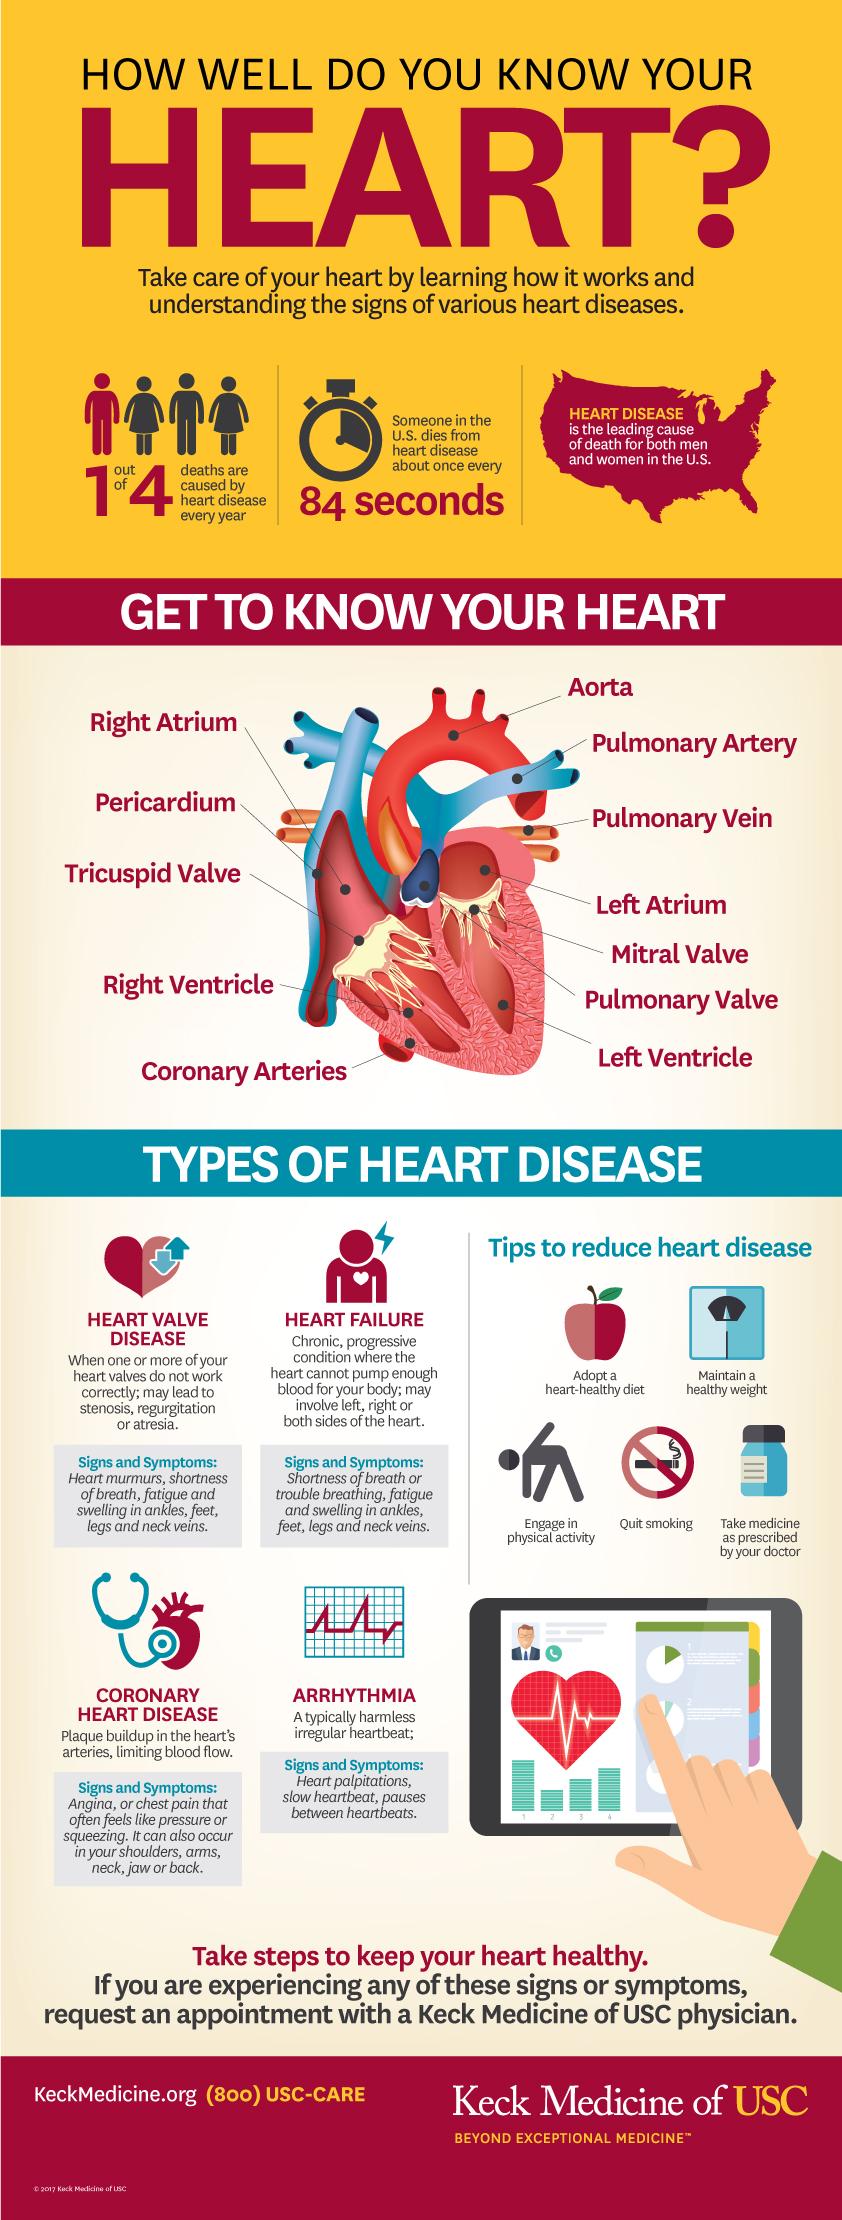 USC CVTI heart health infographic